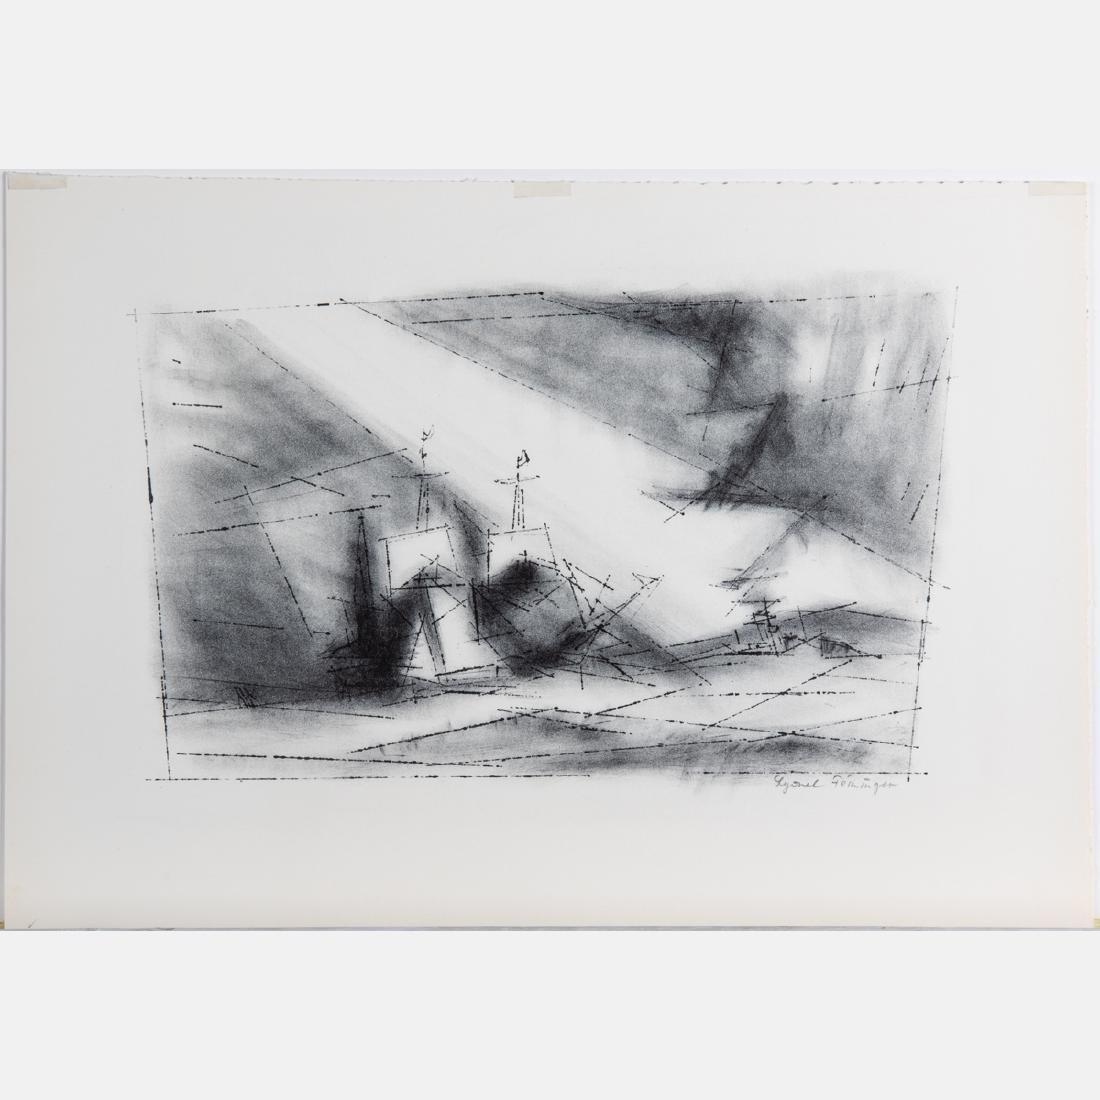 Lyonel Feininger (1871-1956) Off the Coast, 1951,